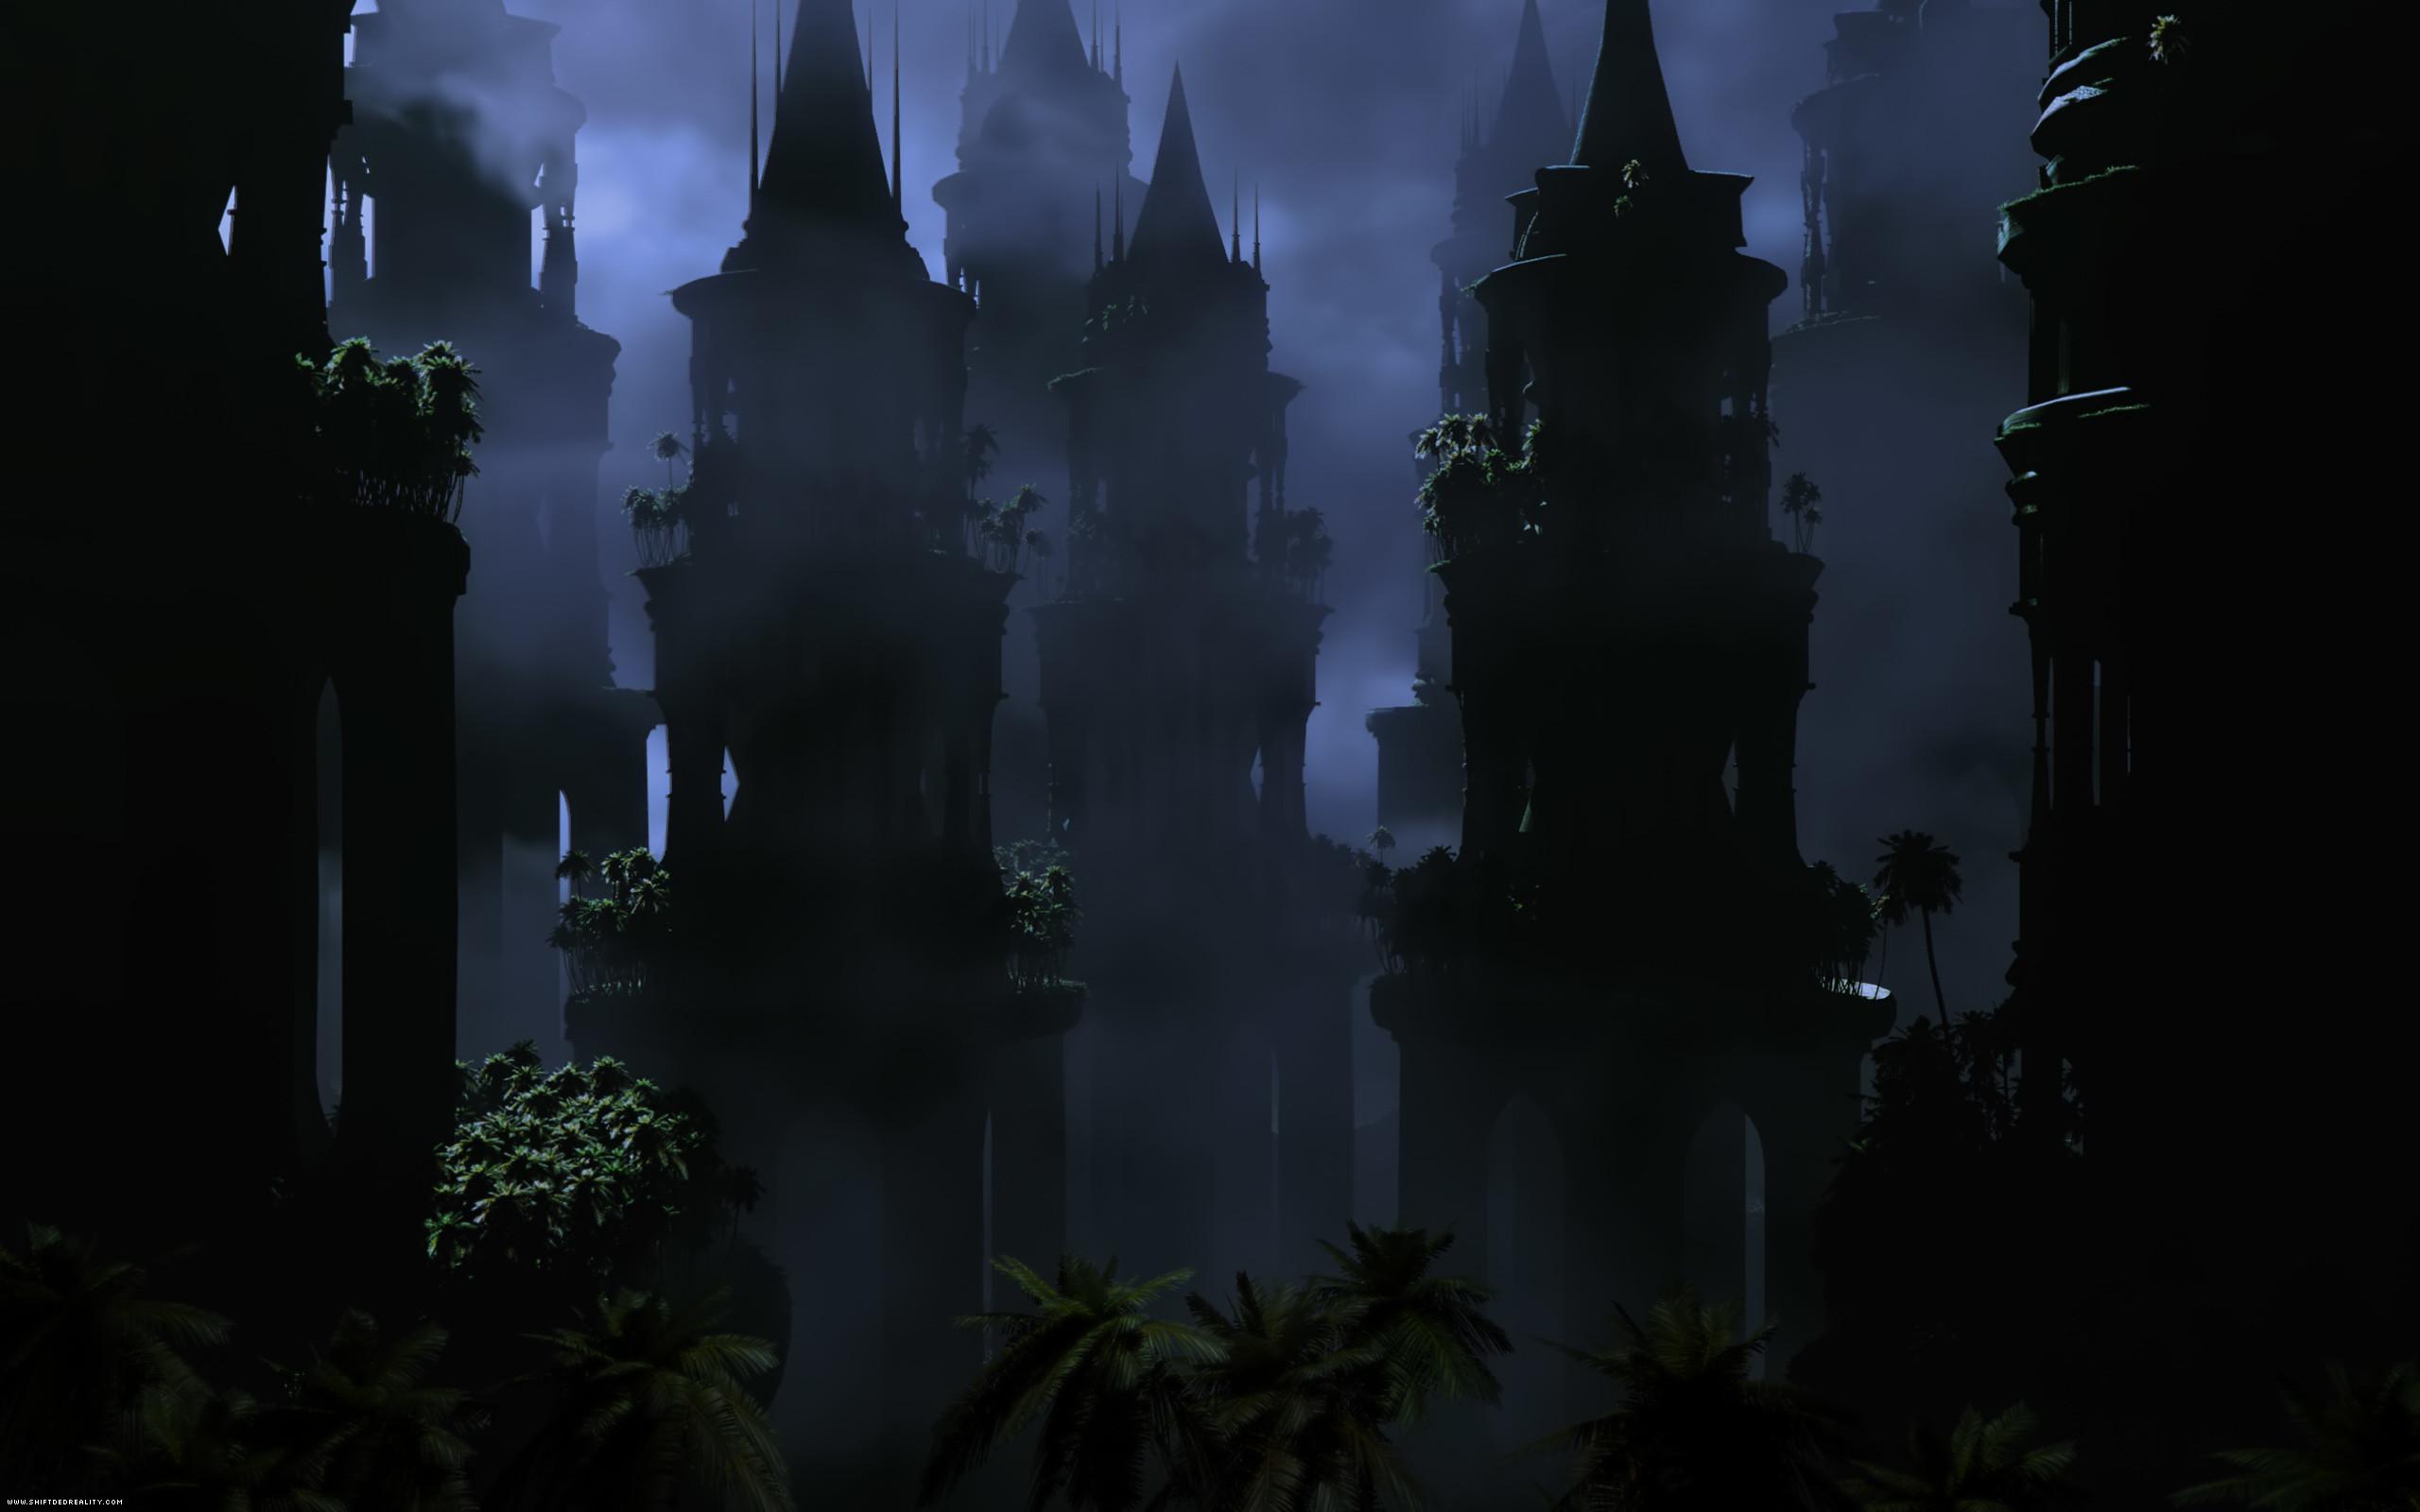 Dark Gothic Photo Gallery   … under: 3D Wallpaper by admin   Social